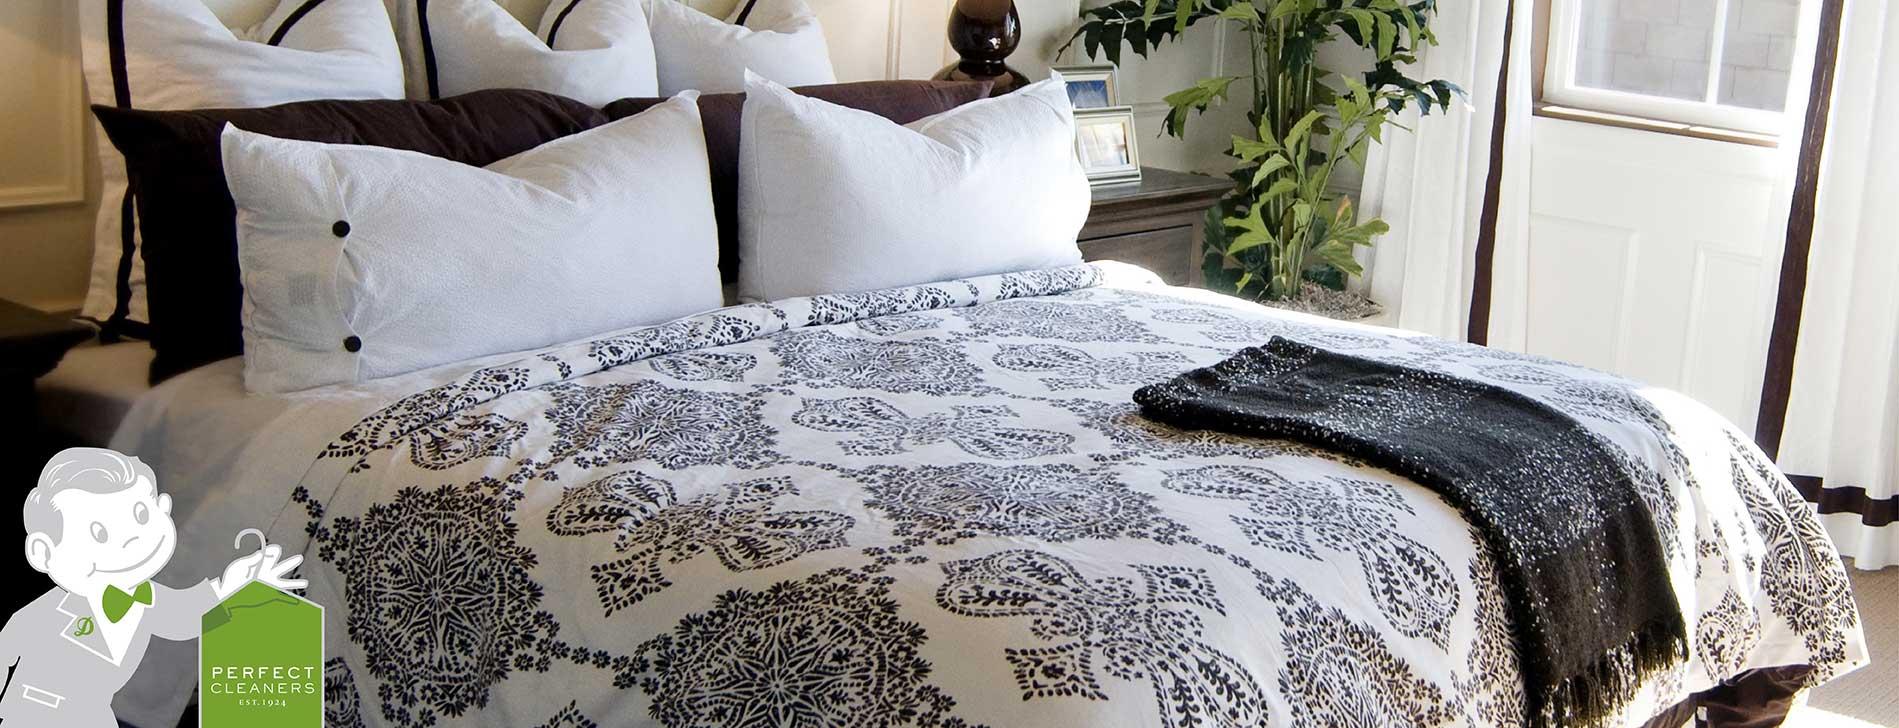 perfect_bedding_HT5_web_banner_feb18